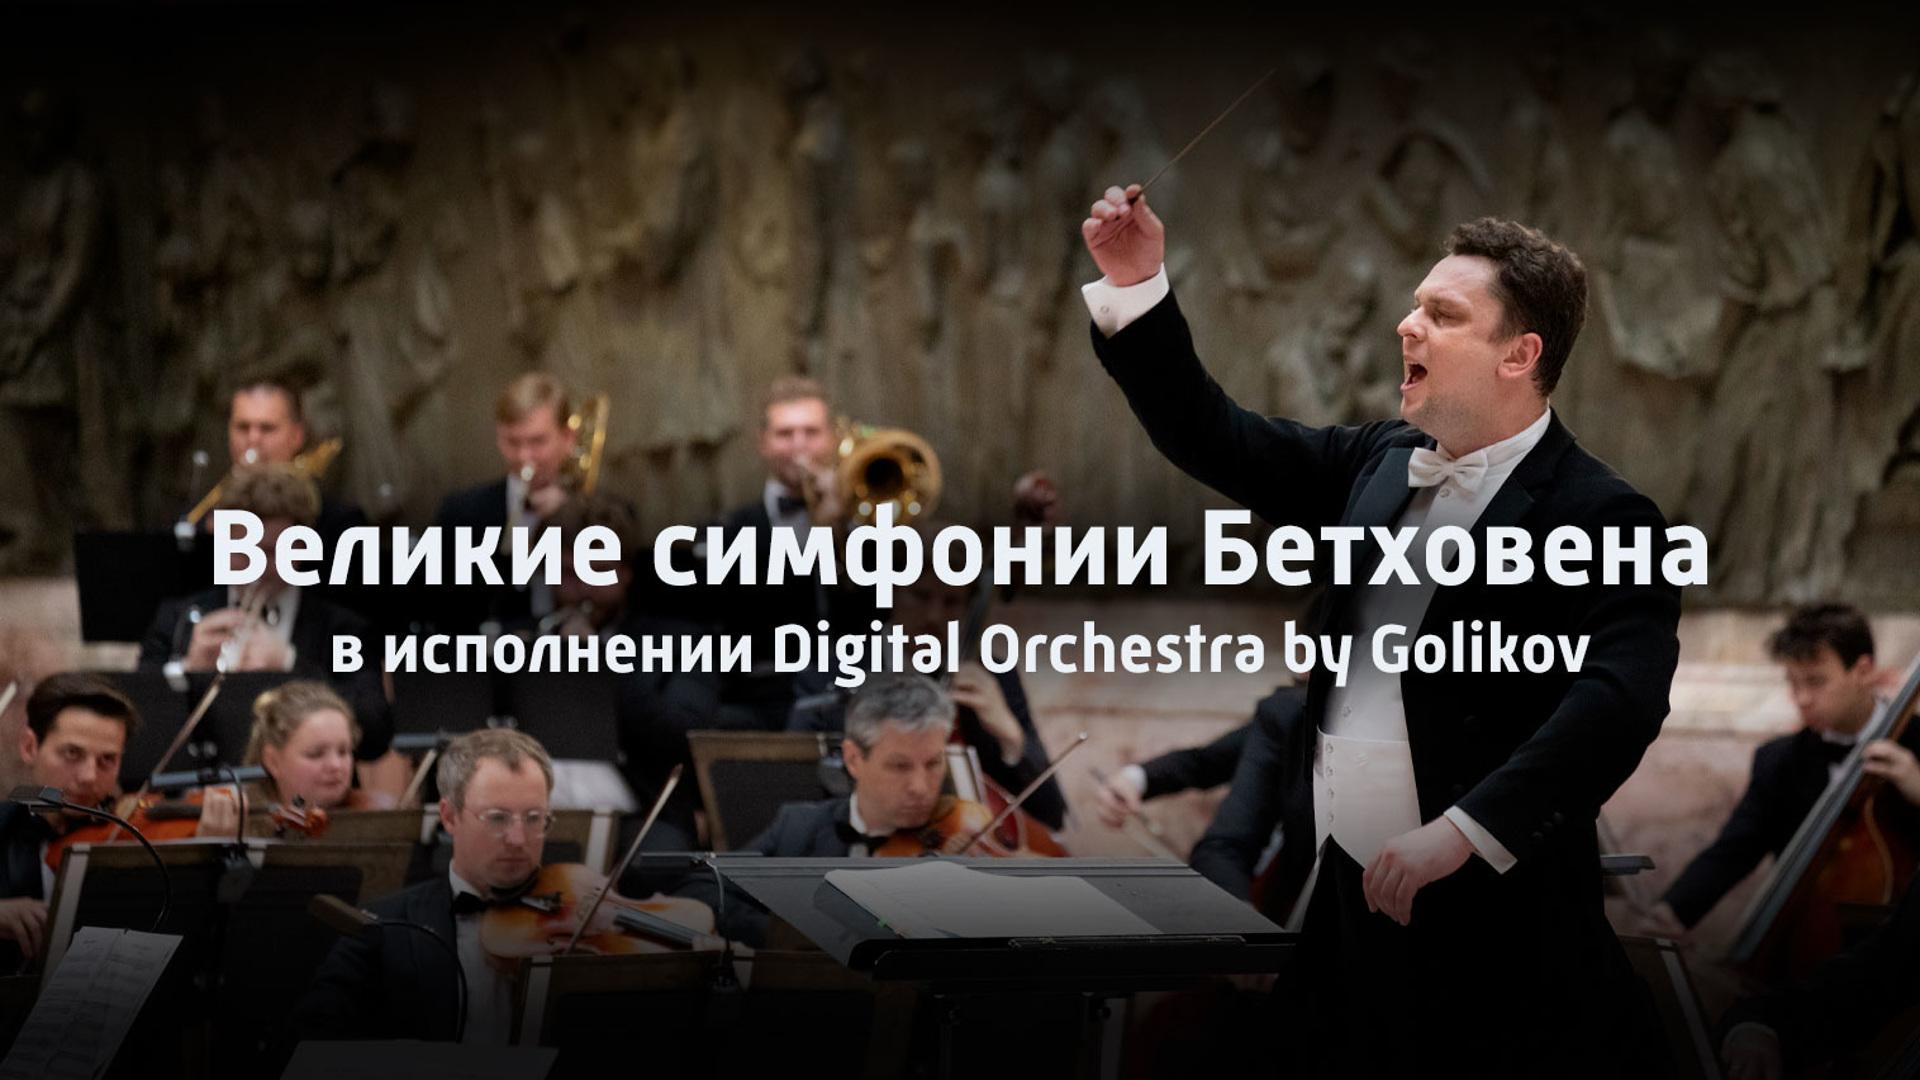 Великие симфонии Бетховена в исполнении Digital Orchestra by Golikov